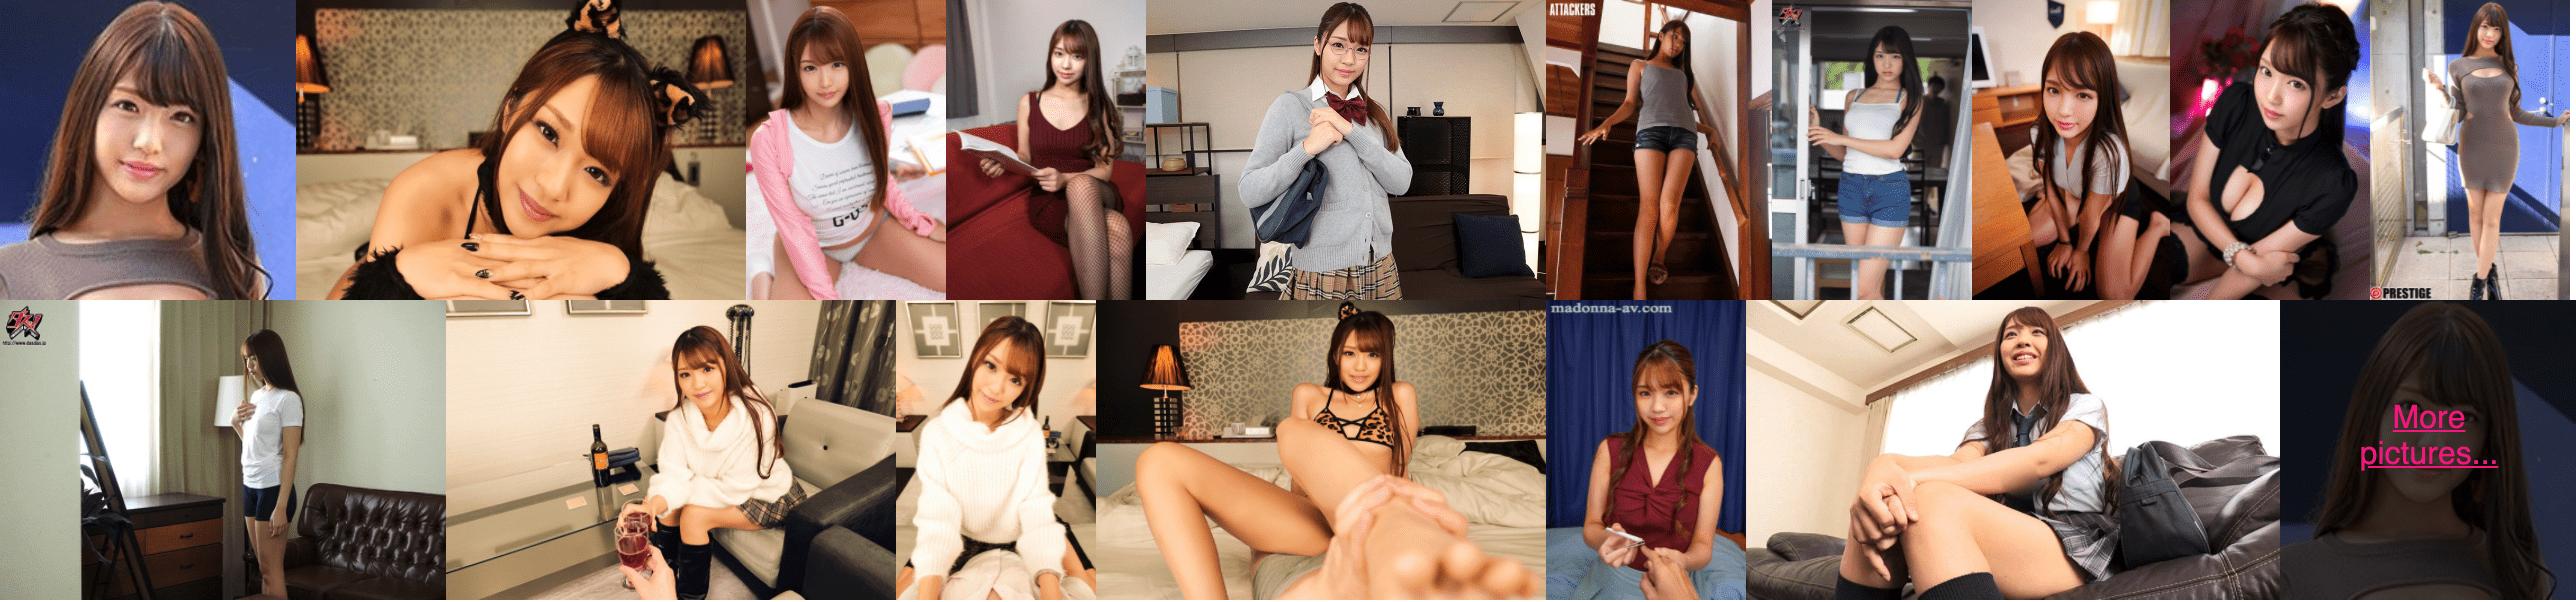 Himari Hanazawa (木下ひまり/Age 25)